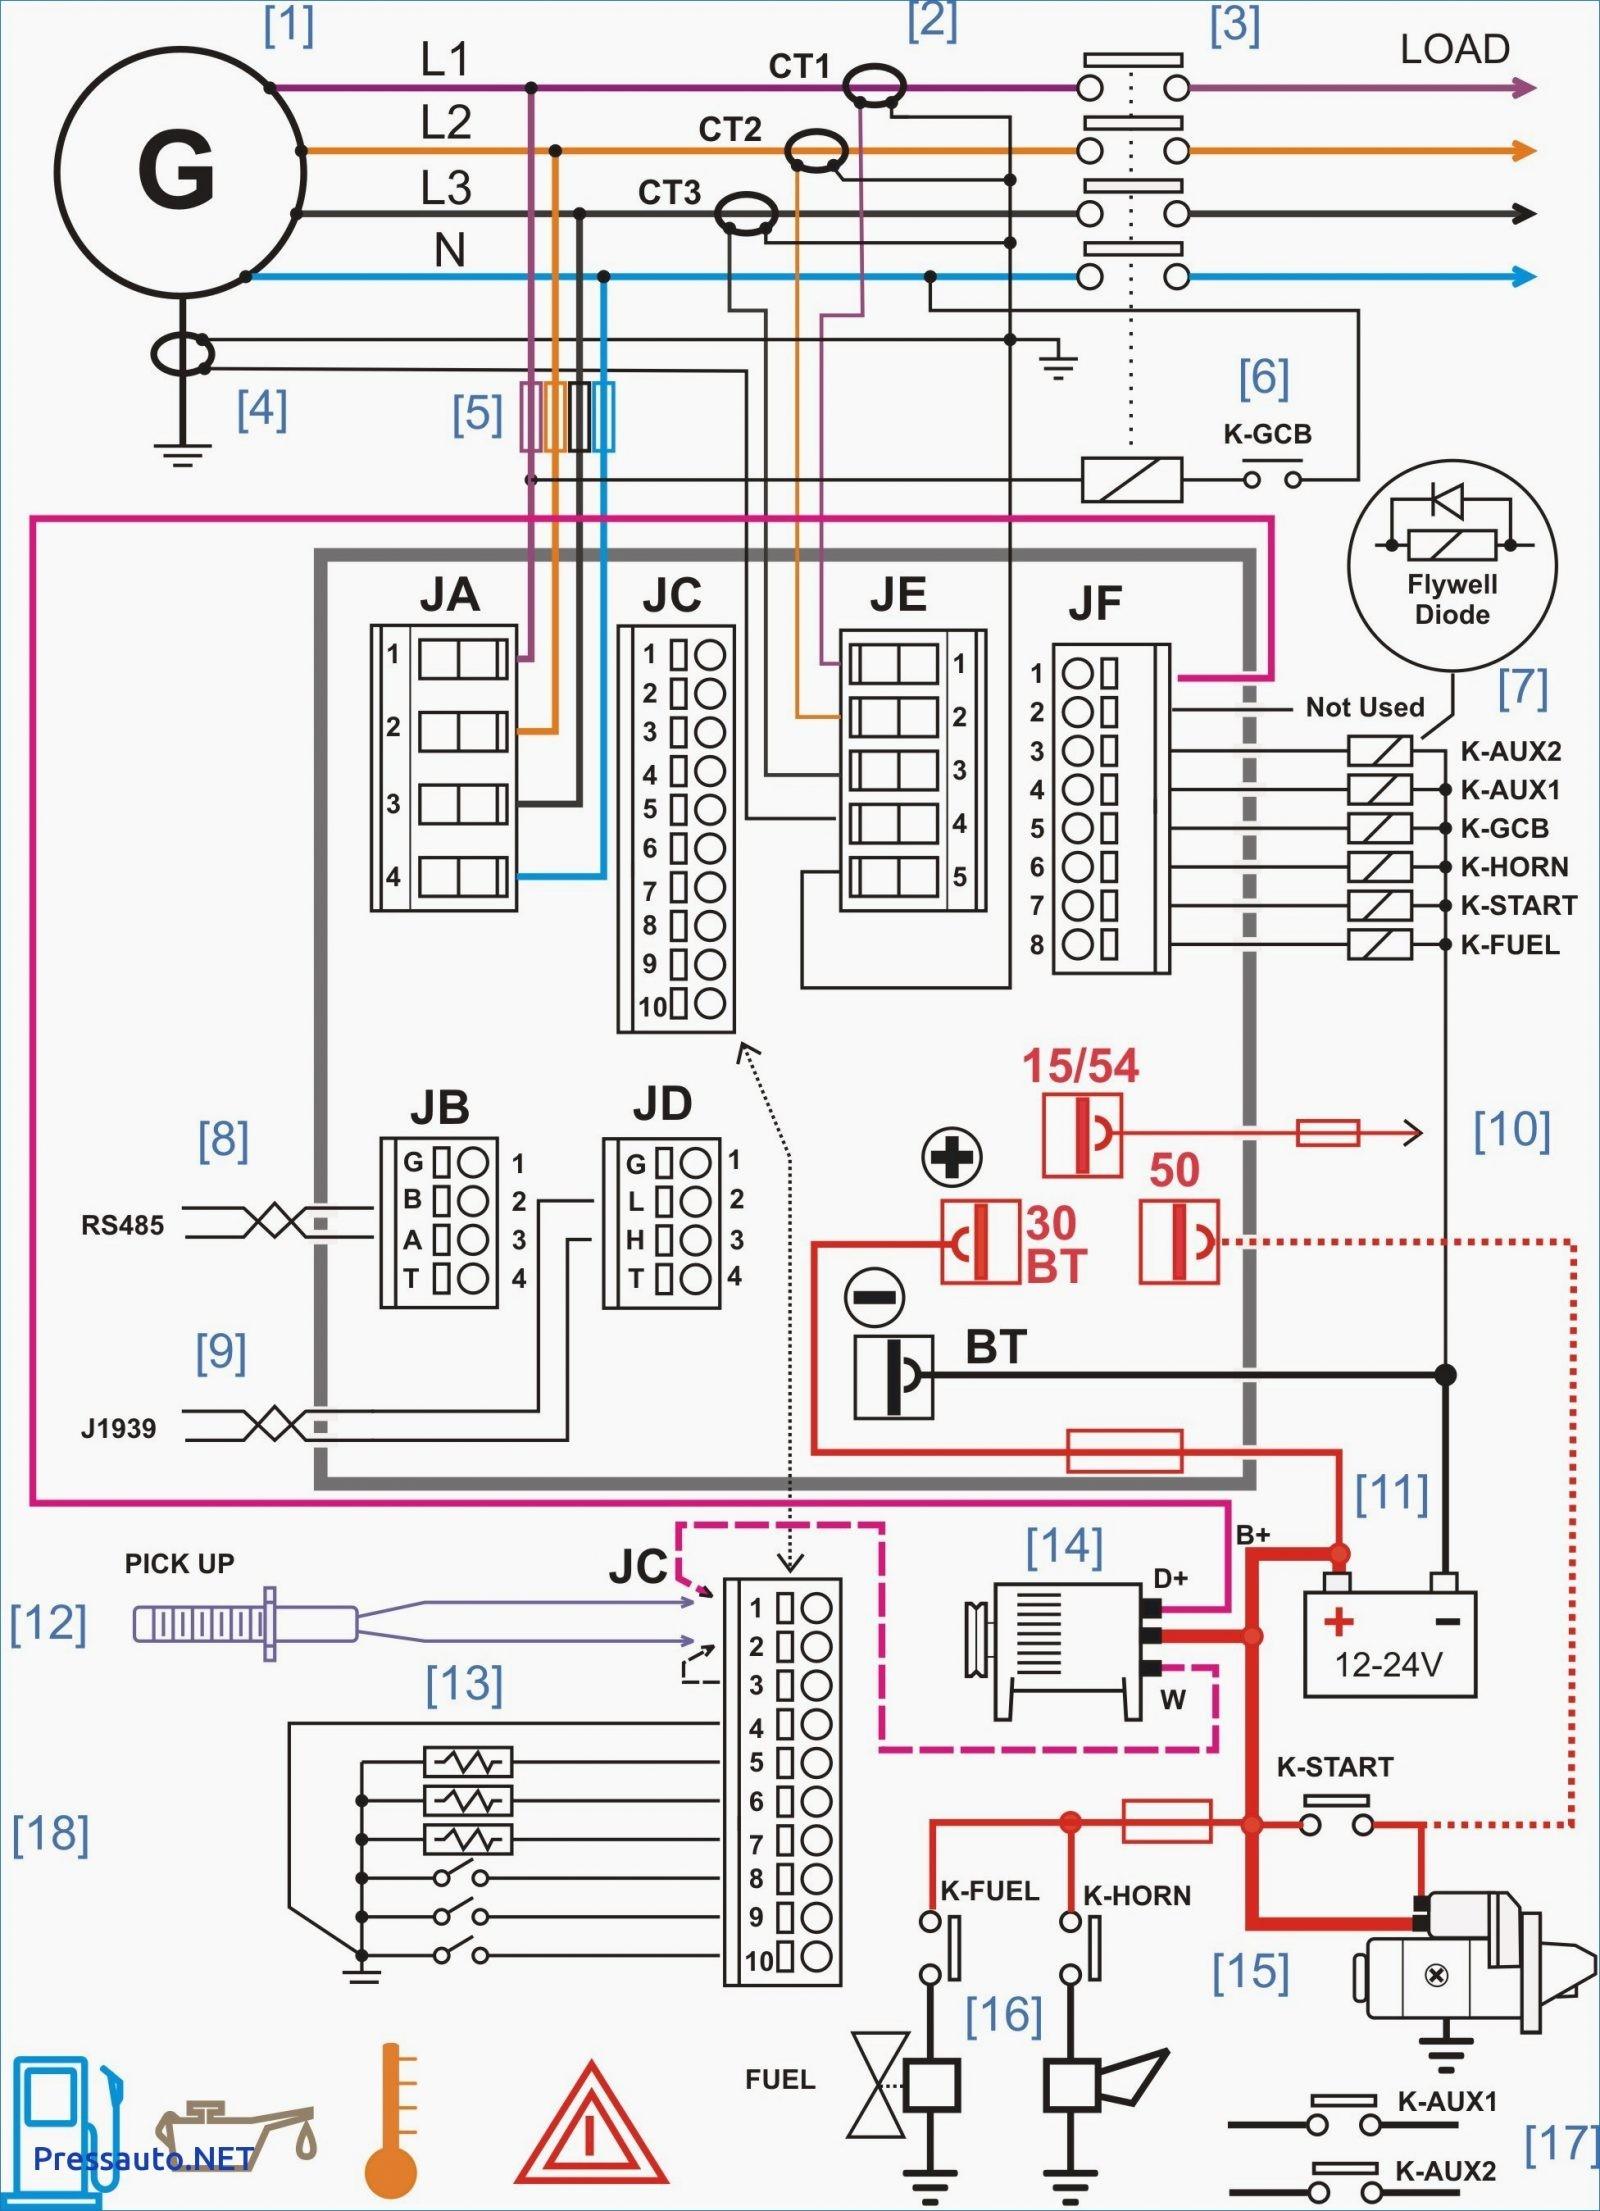 asco 165 transfer switch wiring diagram arbortech us  asco 165 transfer switch wiring diagram wiring diagram imagerh mainetreasurechest com,design